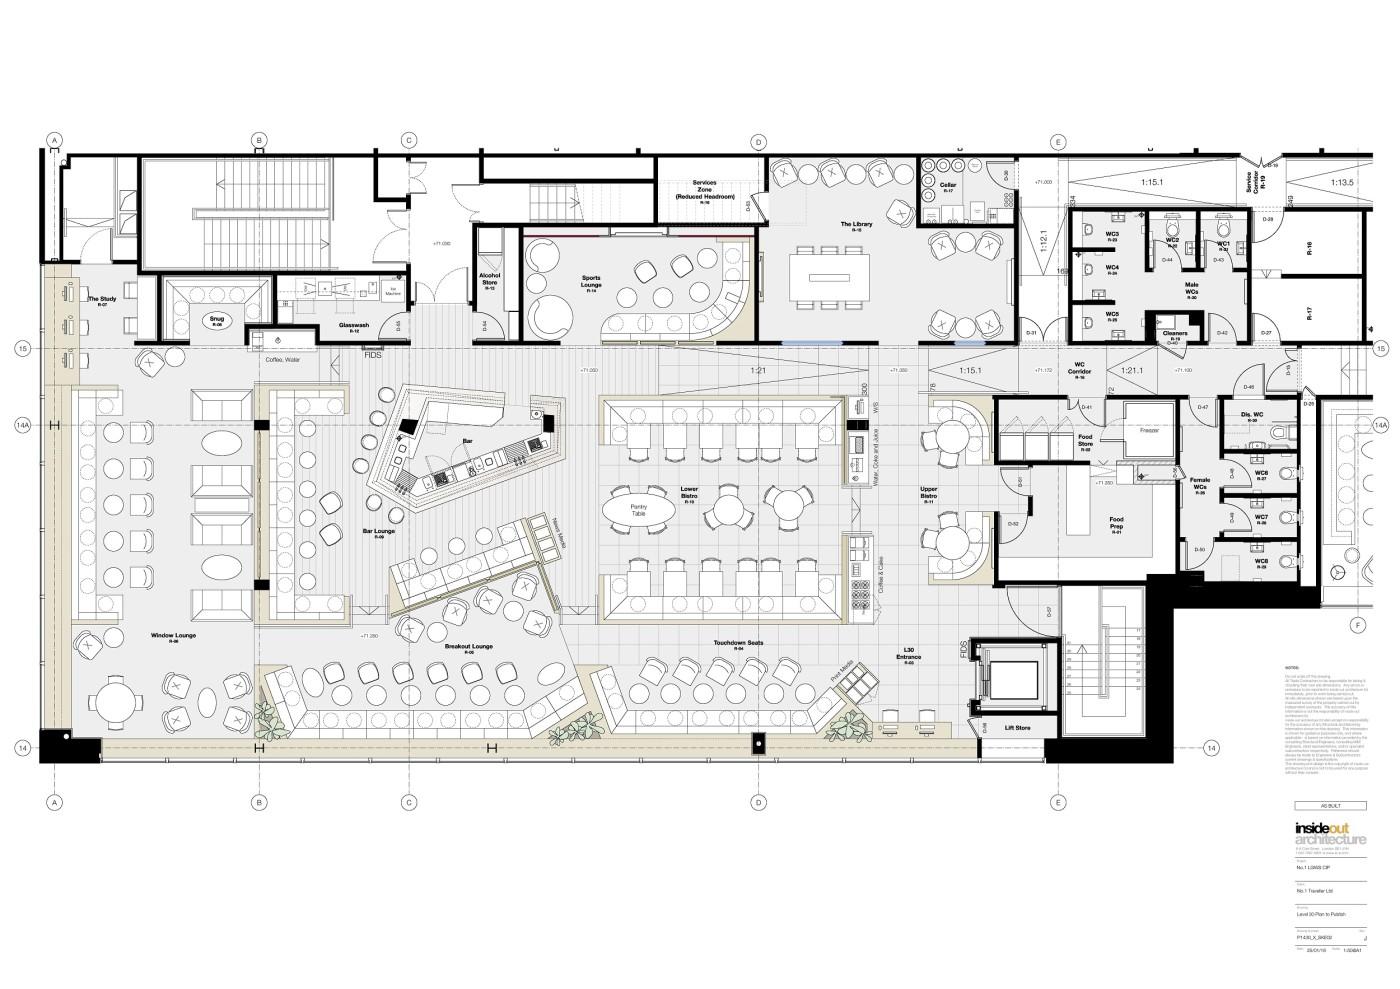 Floor Plan, No1 Gatwick Lounge, South Terminal